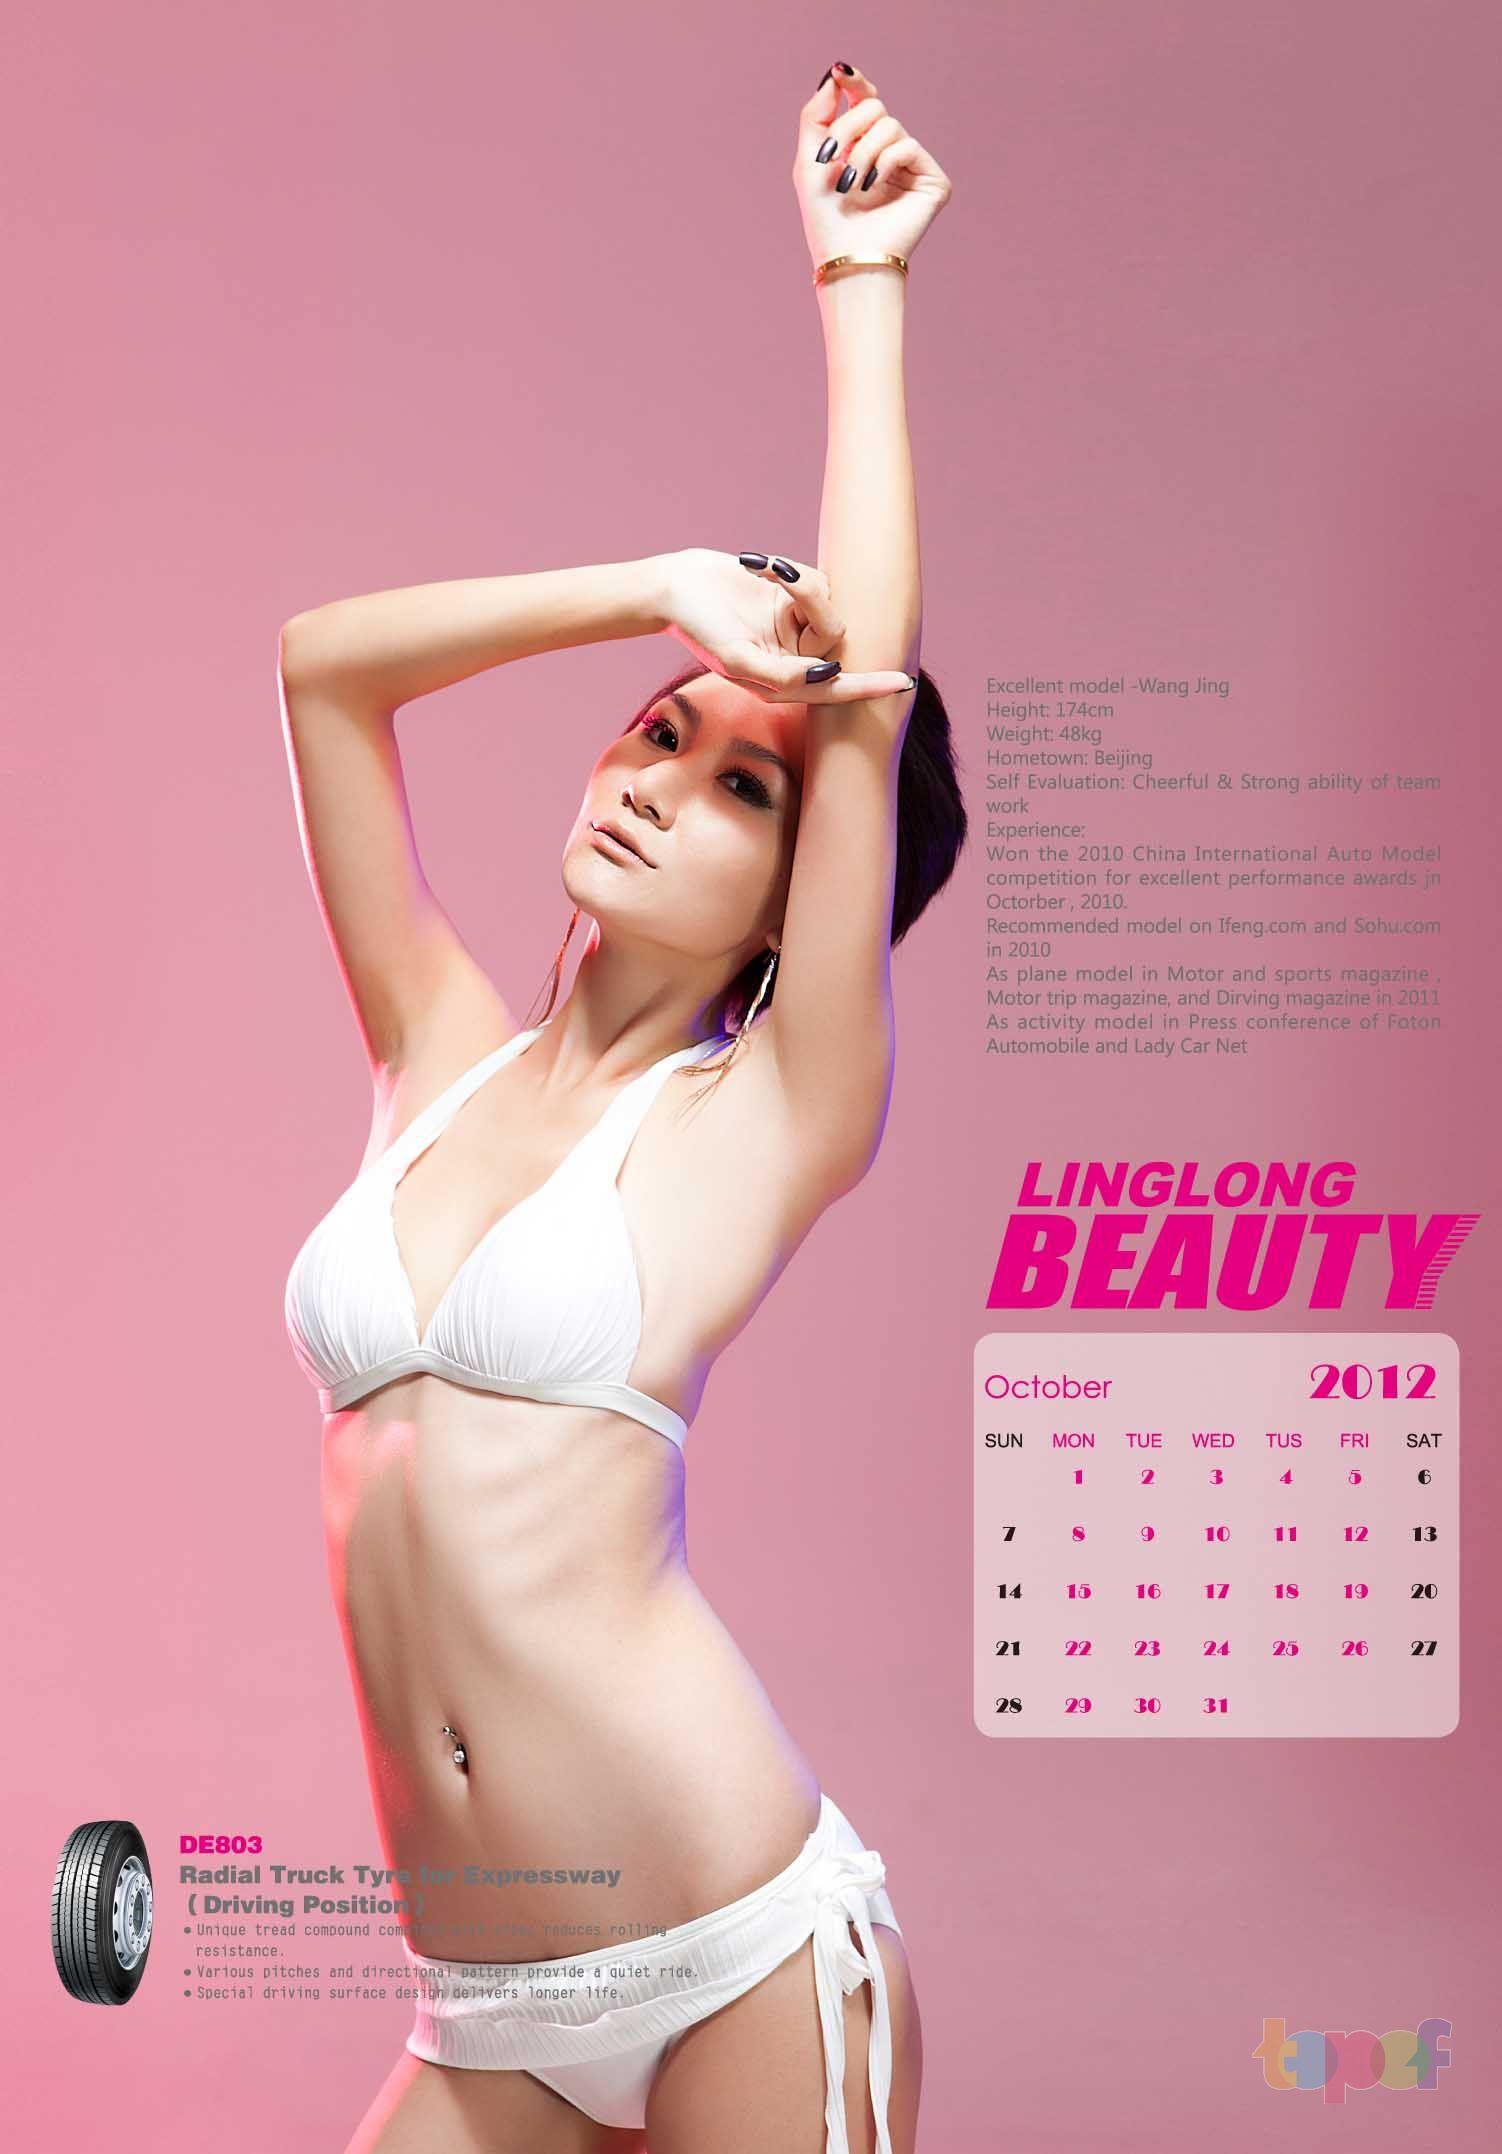 Календари от LingLong (Шины). Октябрь 2012 года